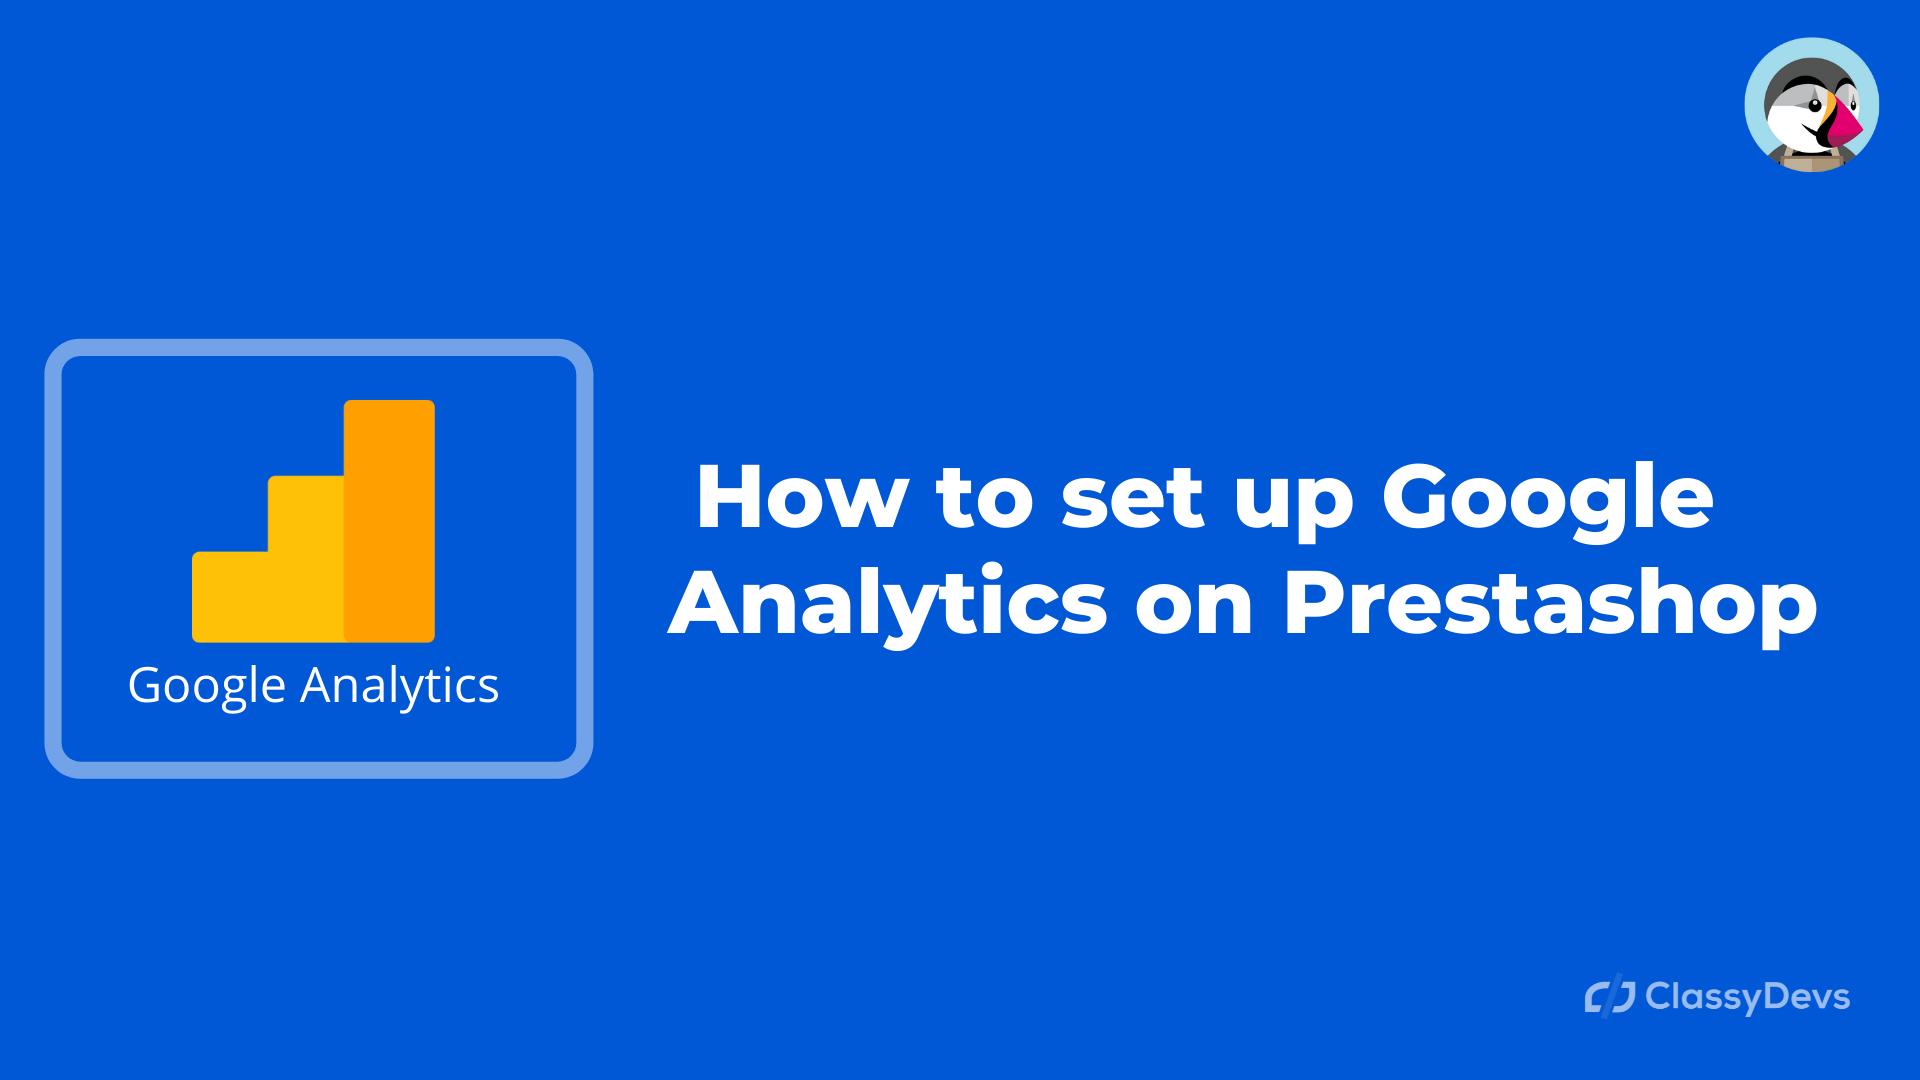 Google Analytics on Prestashop